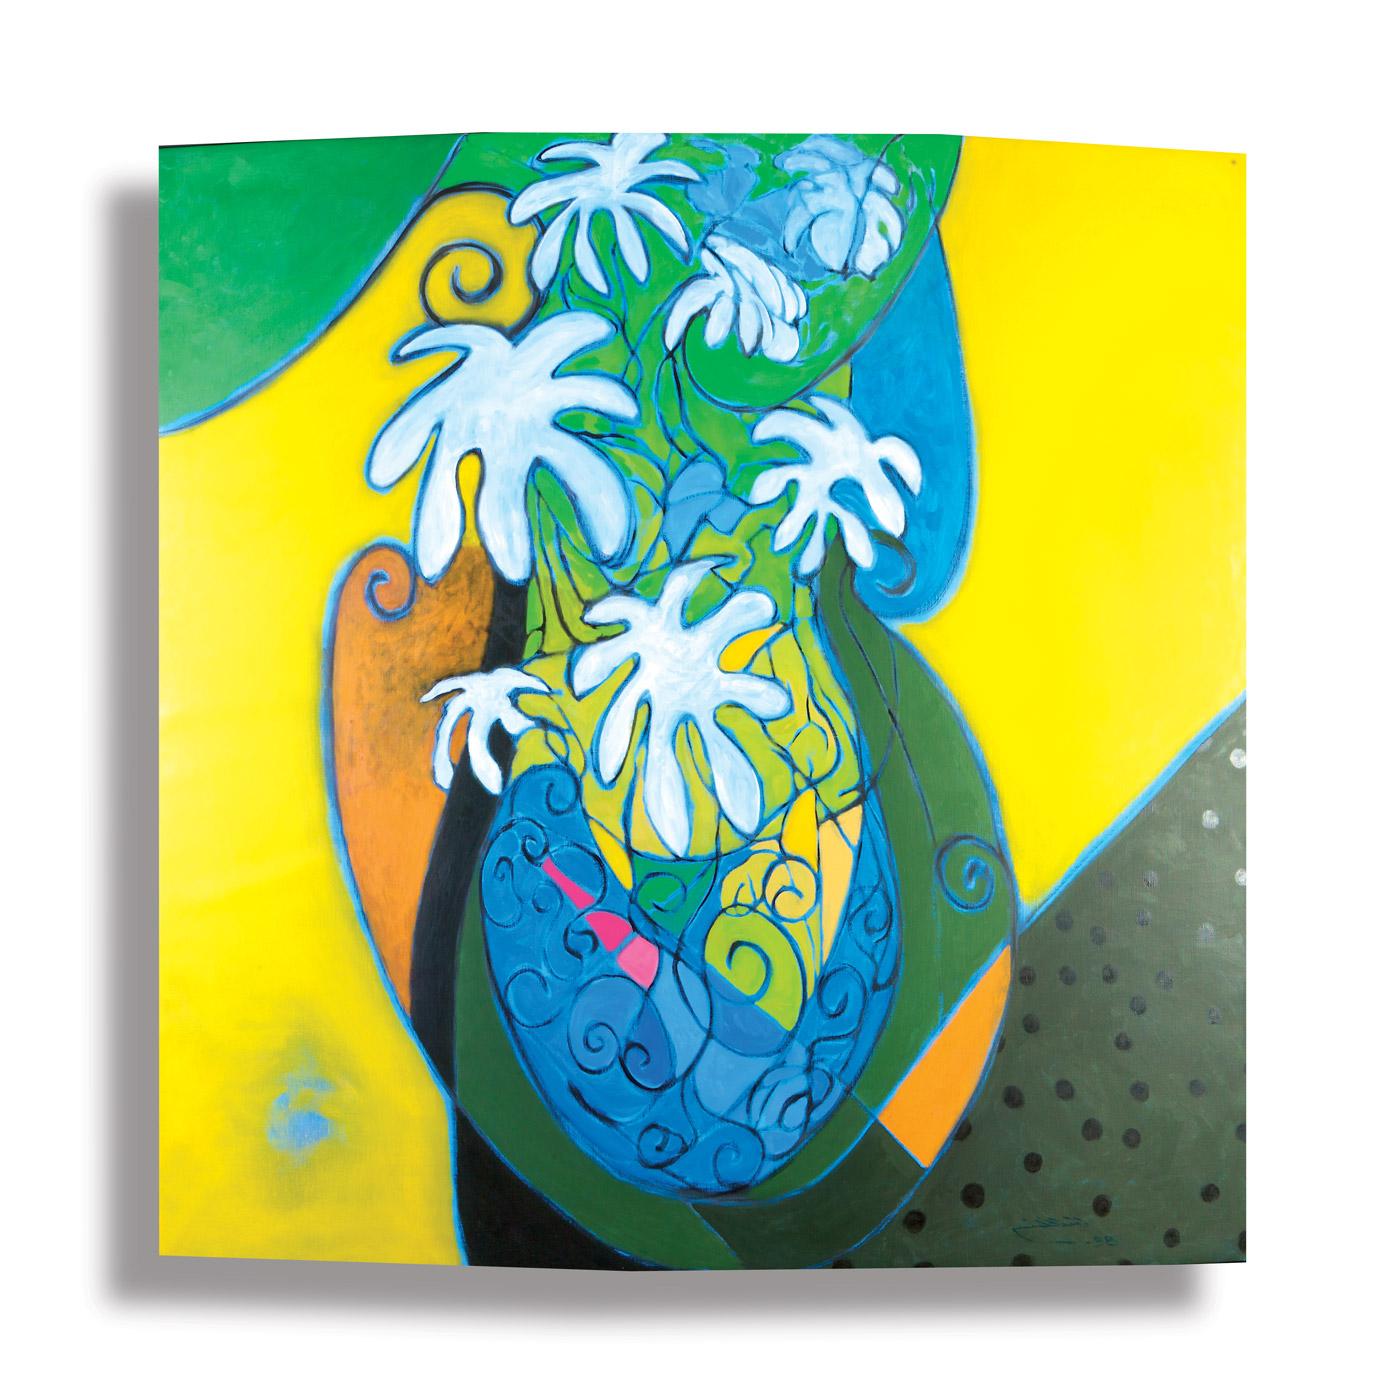 Fragmented-Abstraction-(1)_1998_Oil-on-canvas_168-x-168 rashid al khalifa